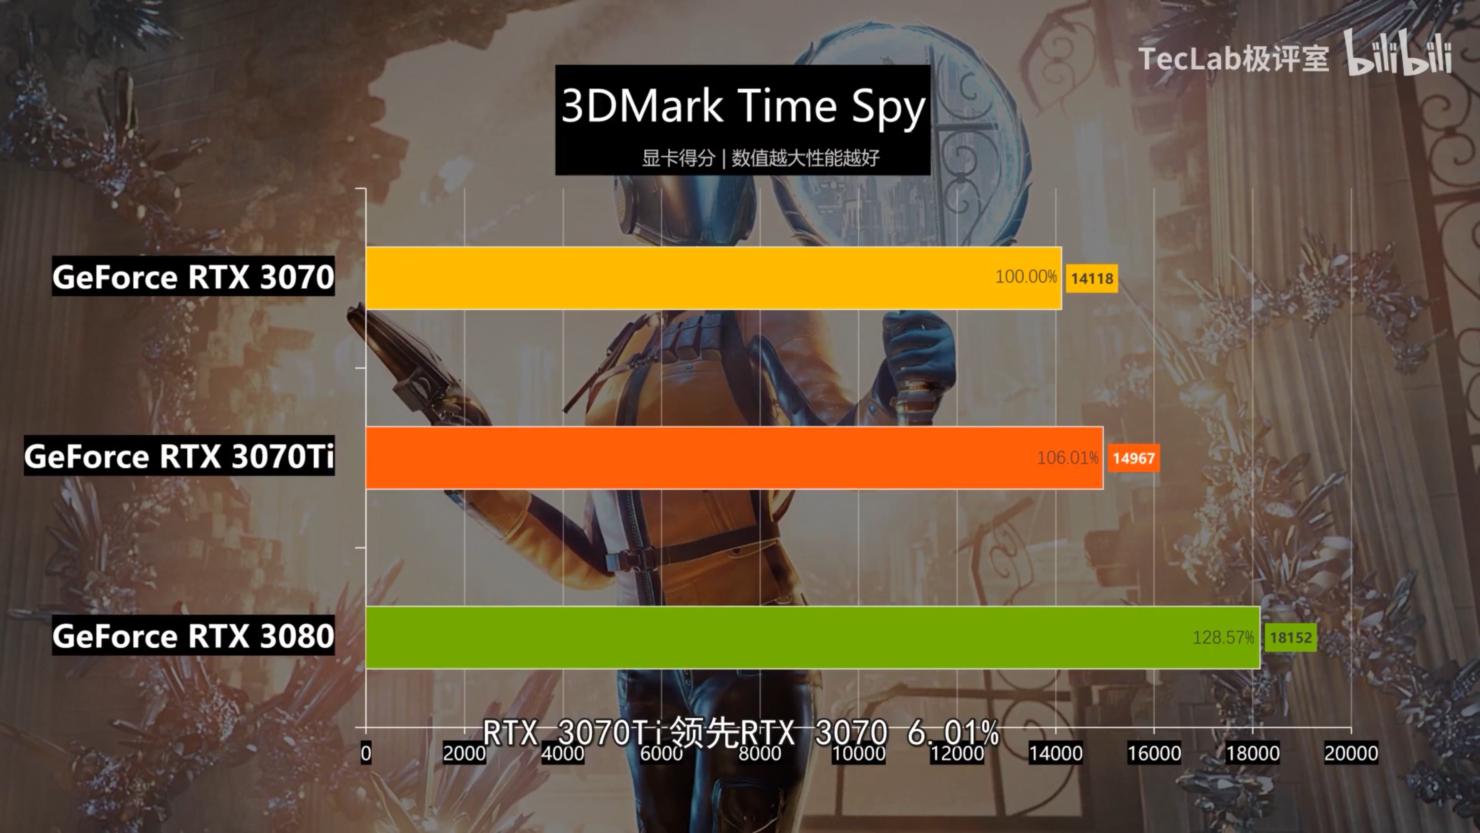 nvidia-geforce-rtx-3070-ti-graphics-card-benchmark-performance-leak-_3dmark-time-spy